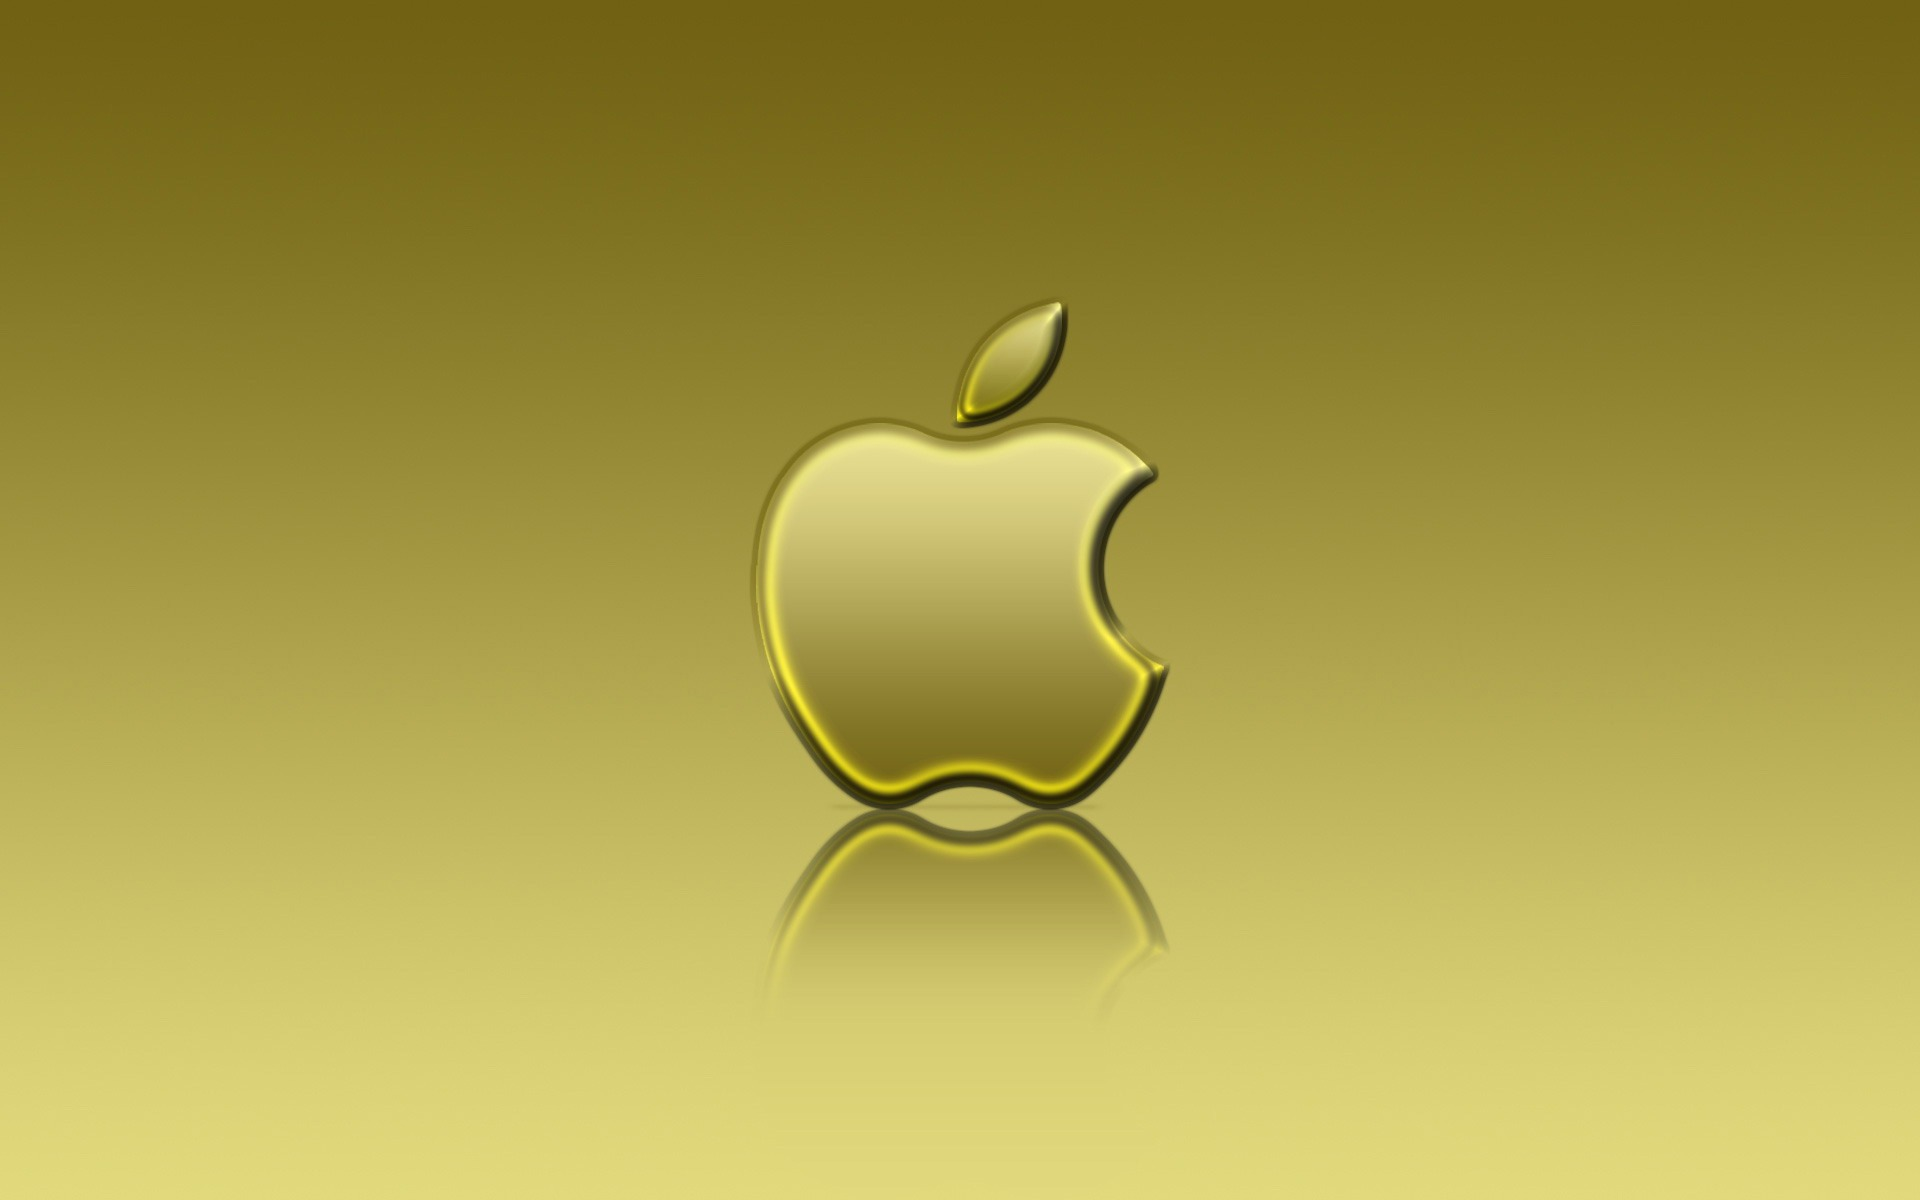 free apple wallpaper download   wwwhigh definition wallpapercom 1920x1200